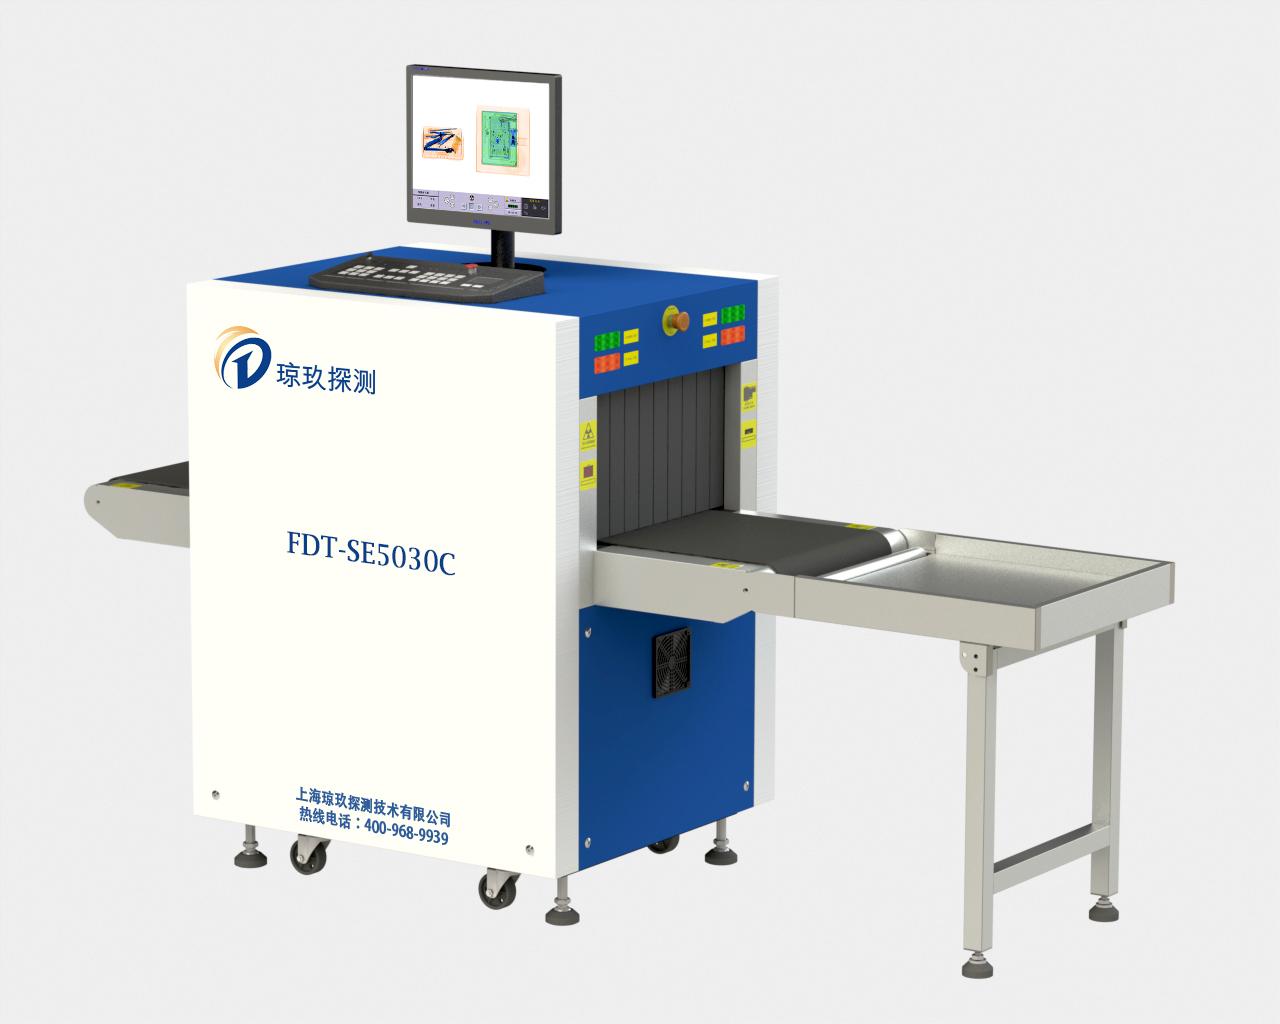 FDT-SE5030C型 X射线检查设备安检机安检仪小型安检仪公检法机关专用